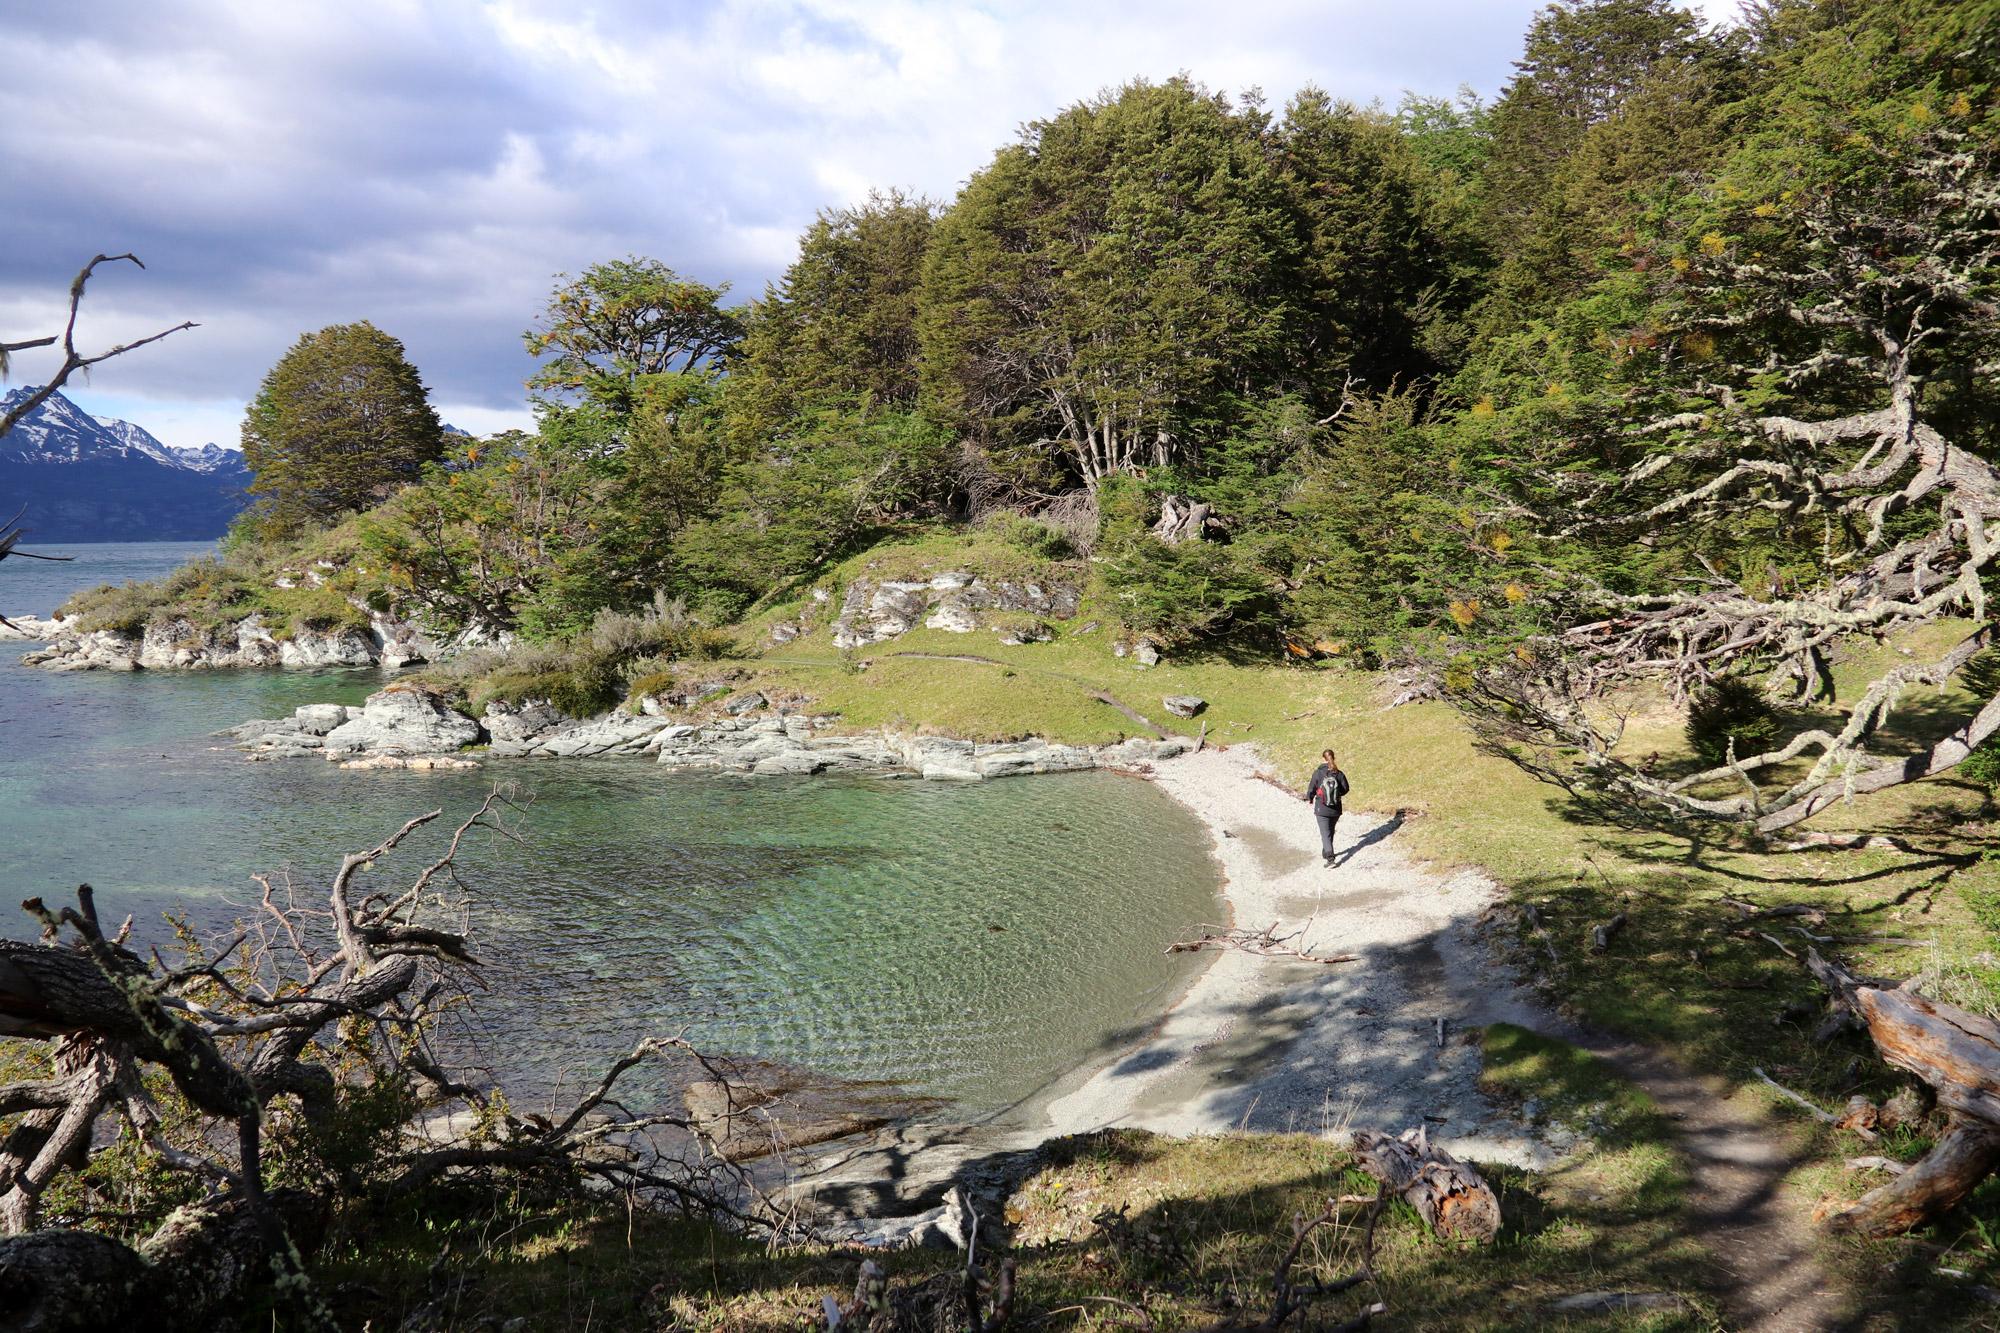 Mooiste reisfoto's 2018 - Tierra del Fuego